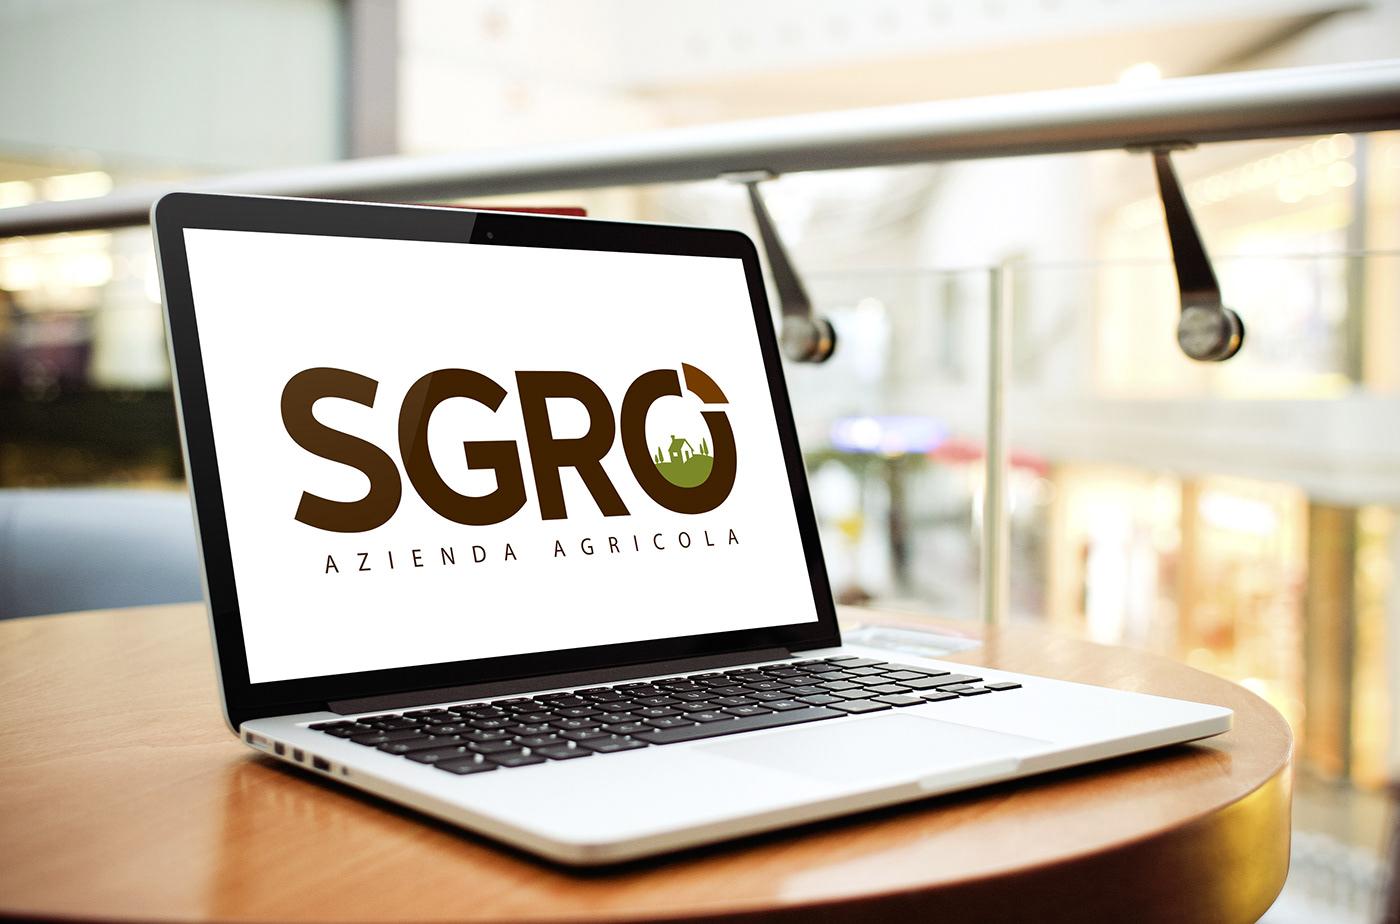 azienda agricola logo brand Website brochure